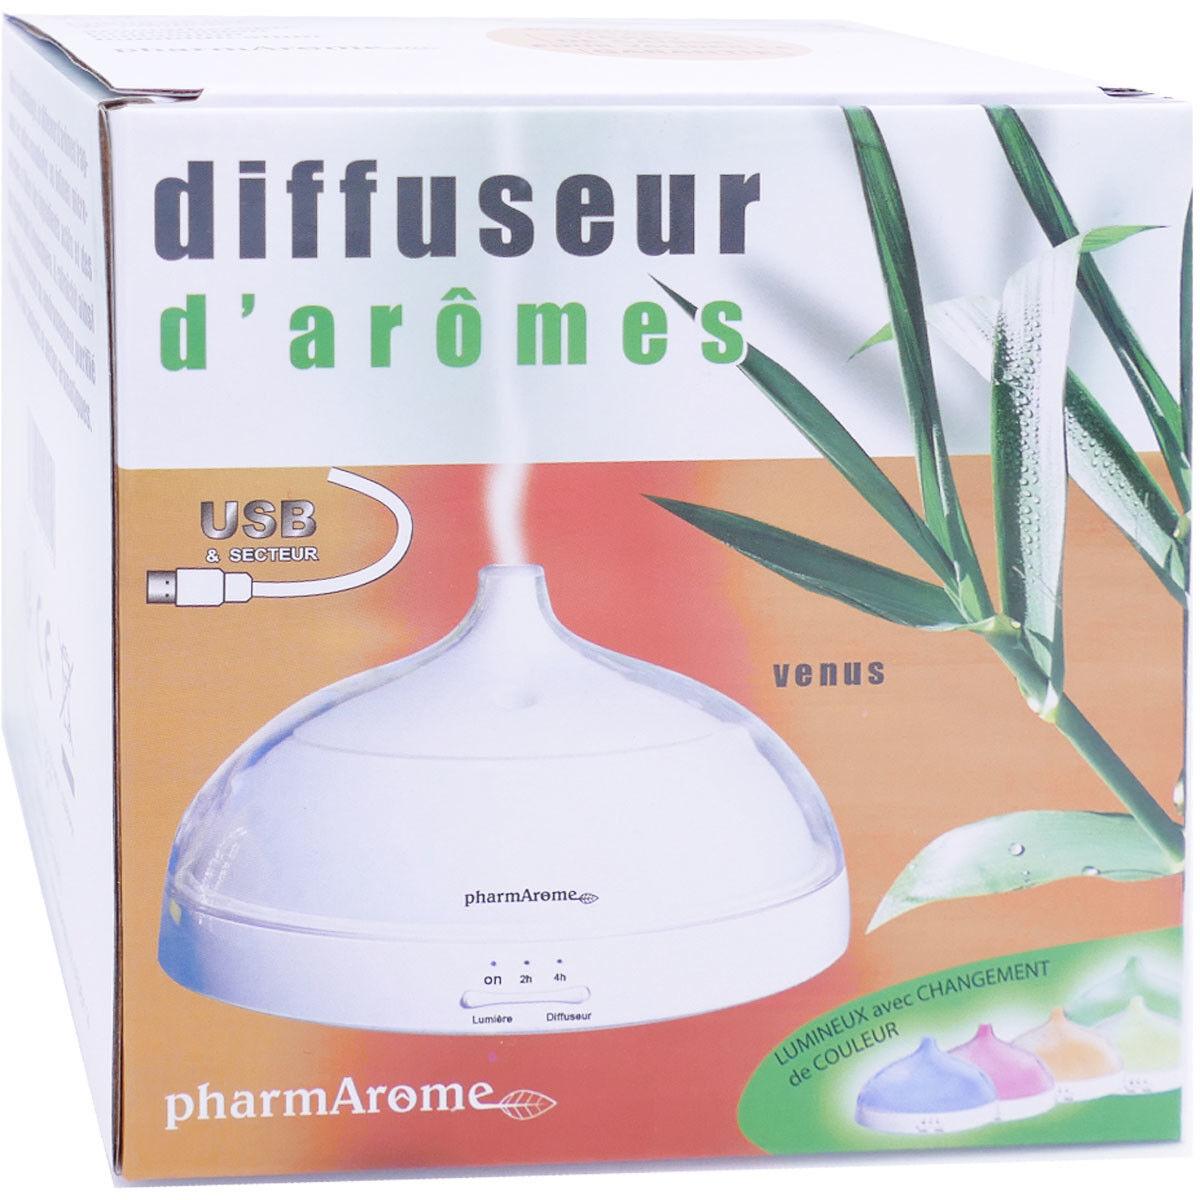 MATHIEU Pharmarome diffuseur d'aromes